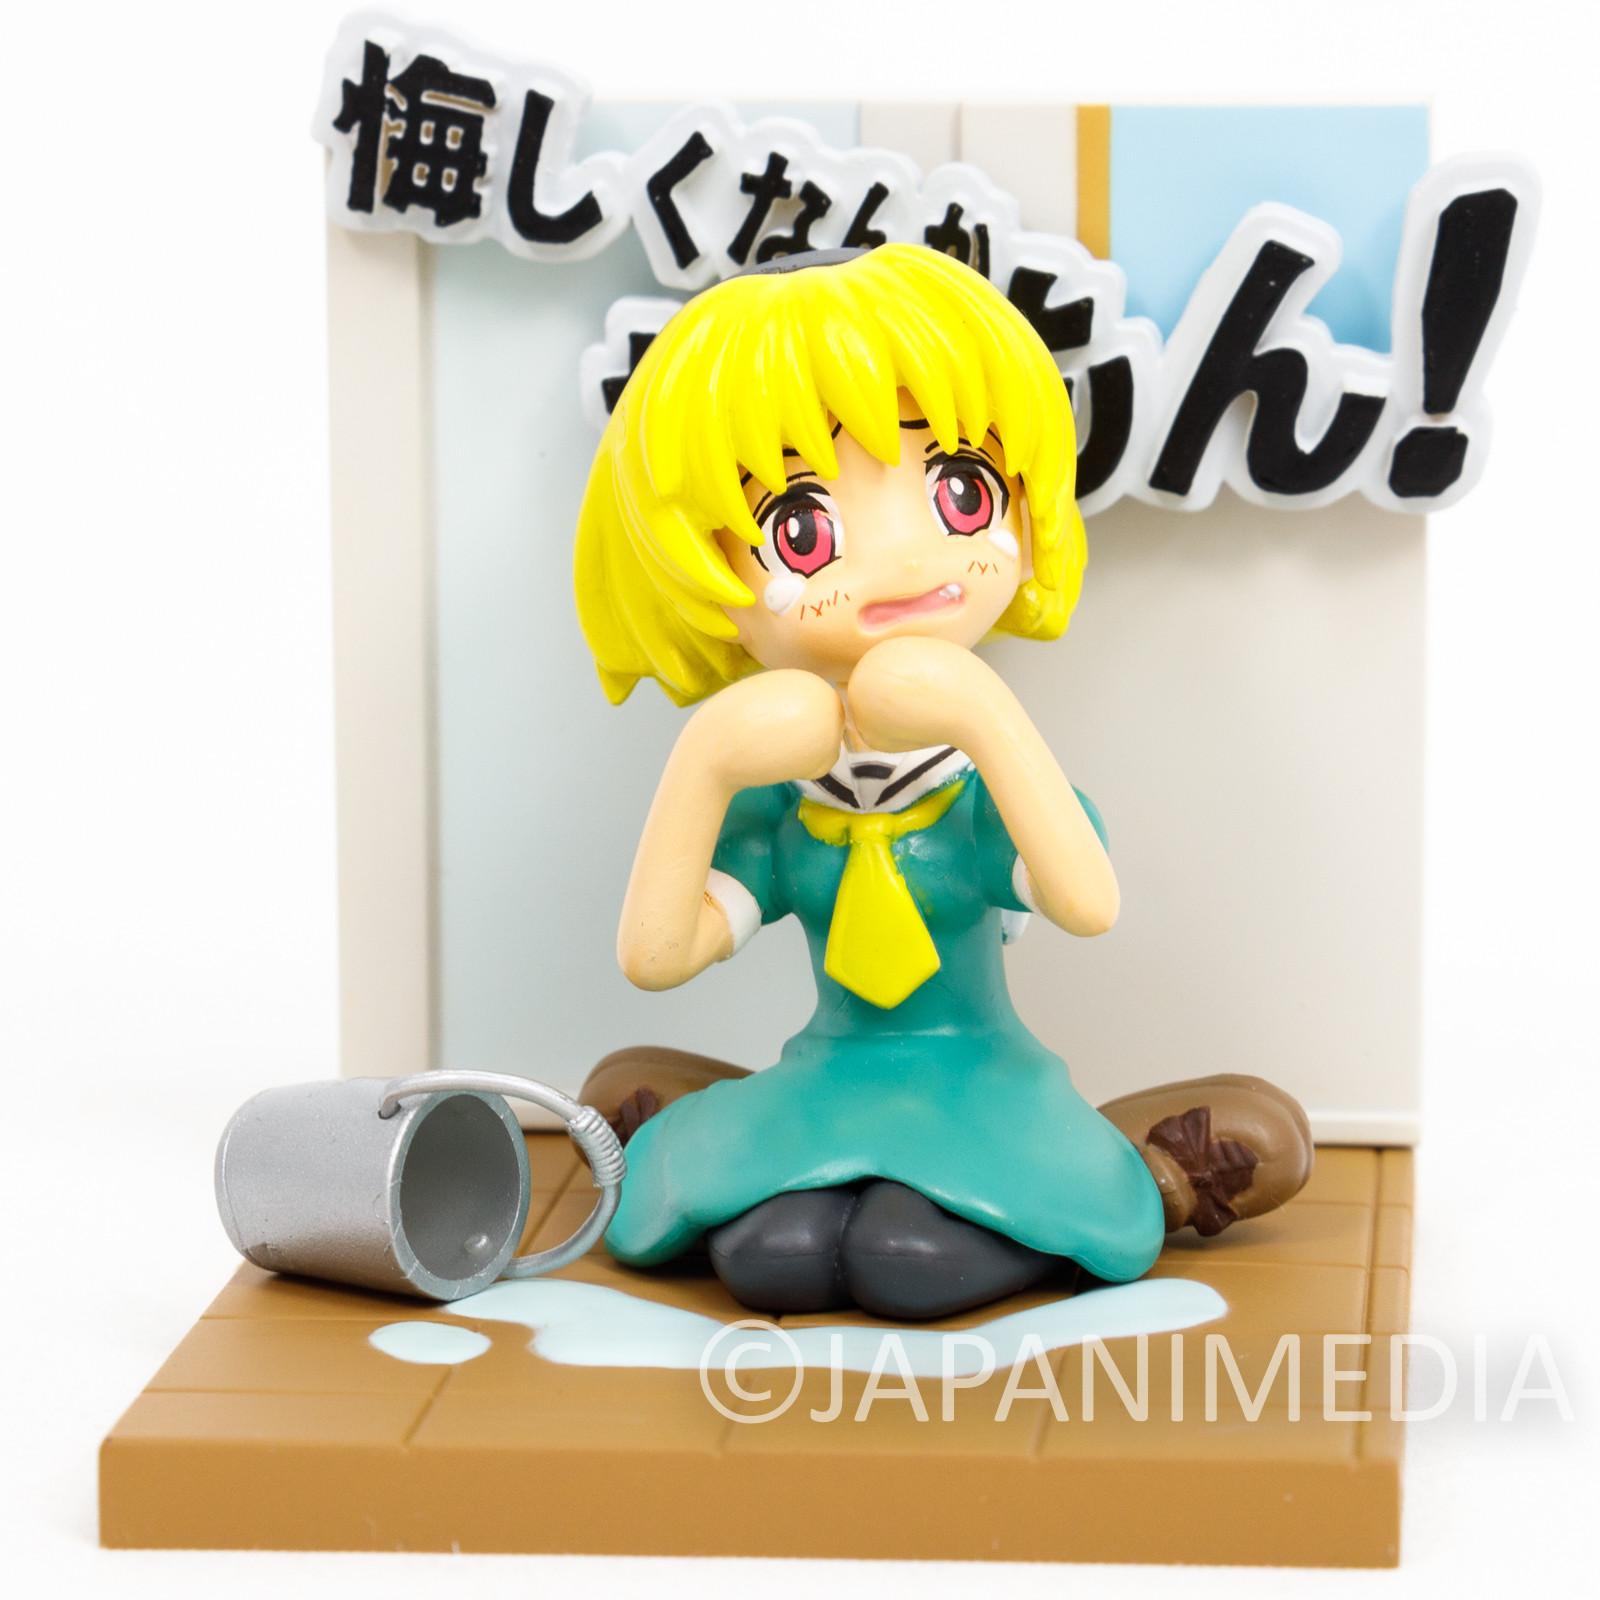 When They Cry Satoko Hojo Miniature Diorama Figure